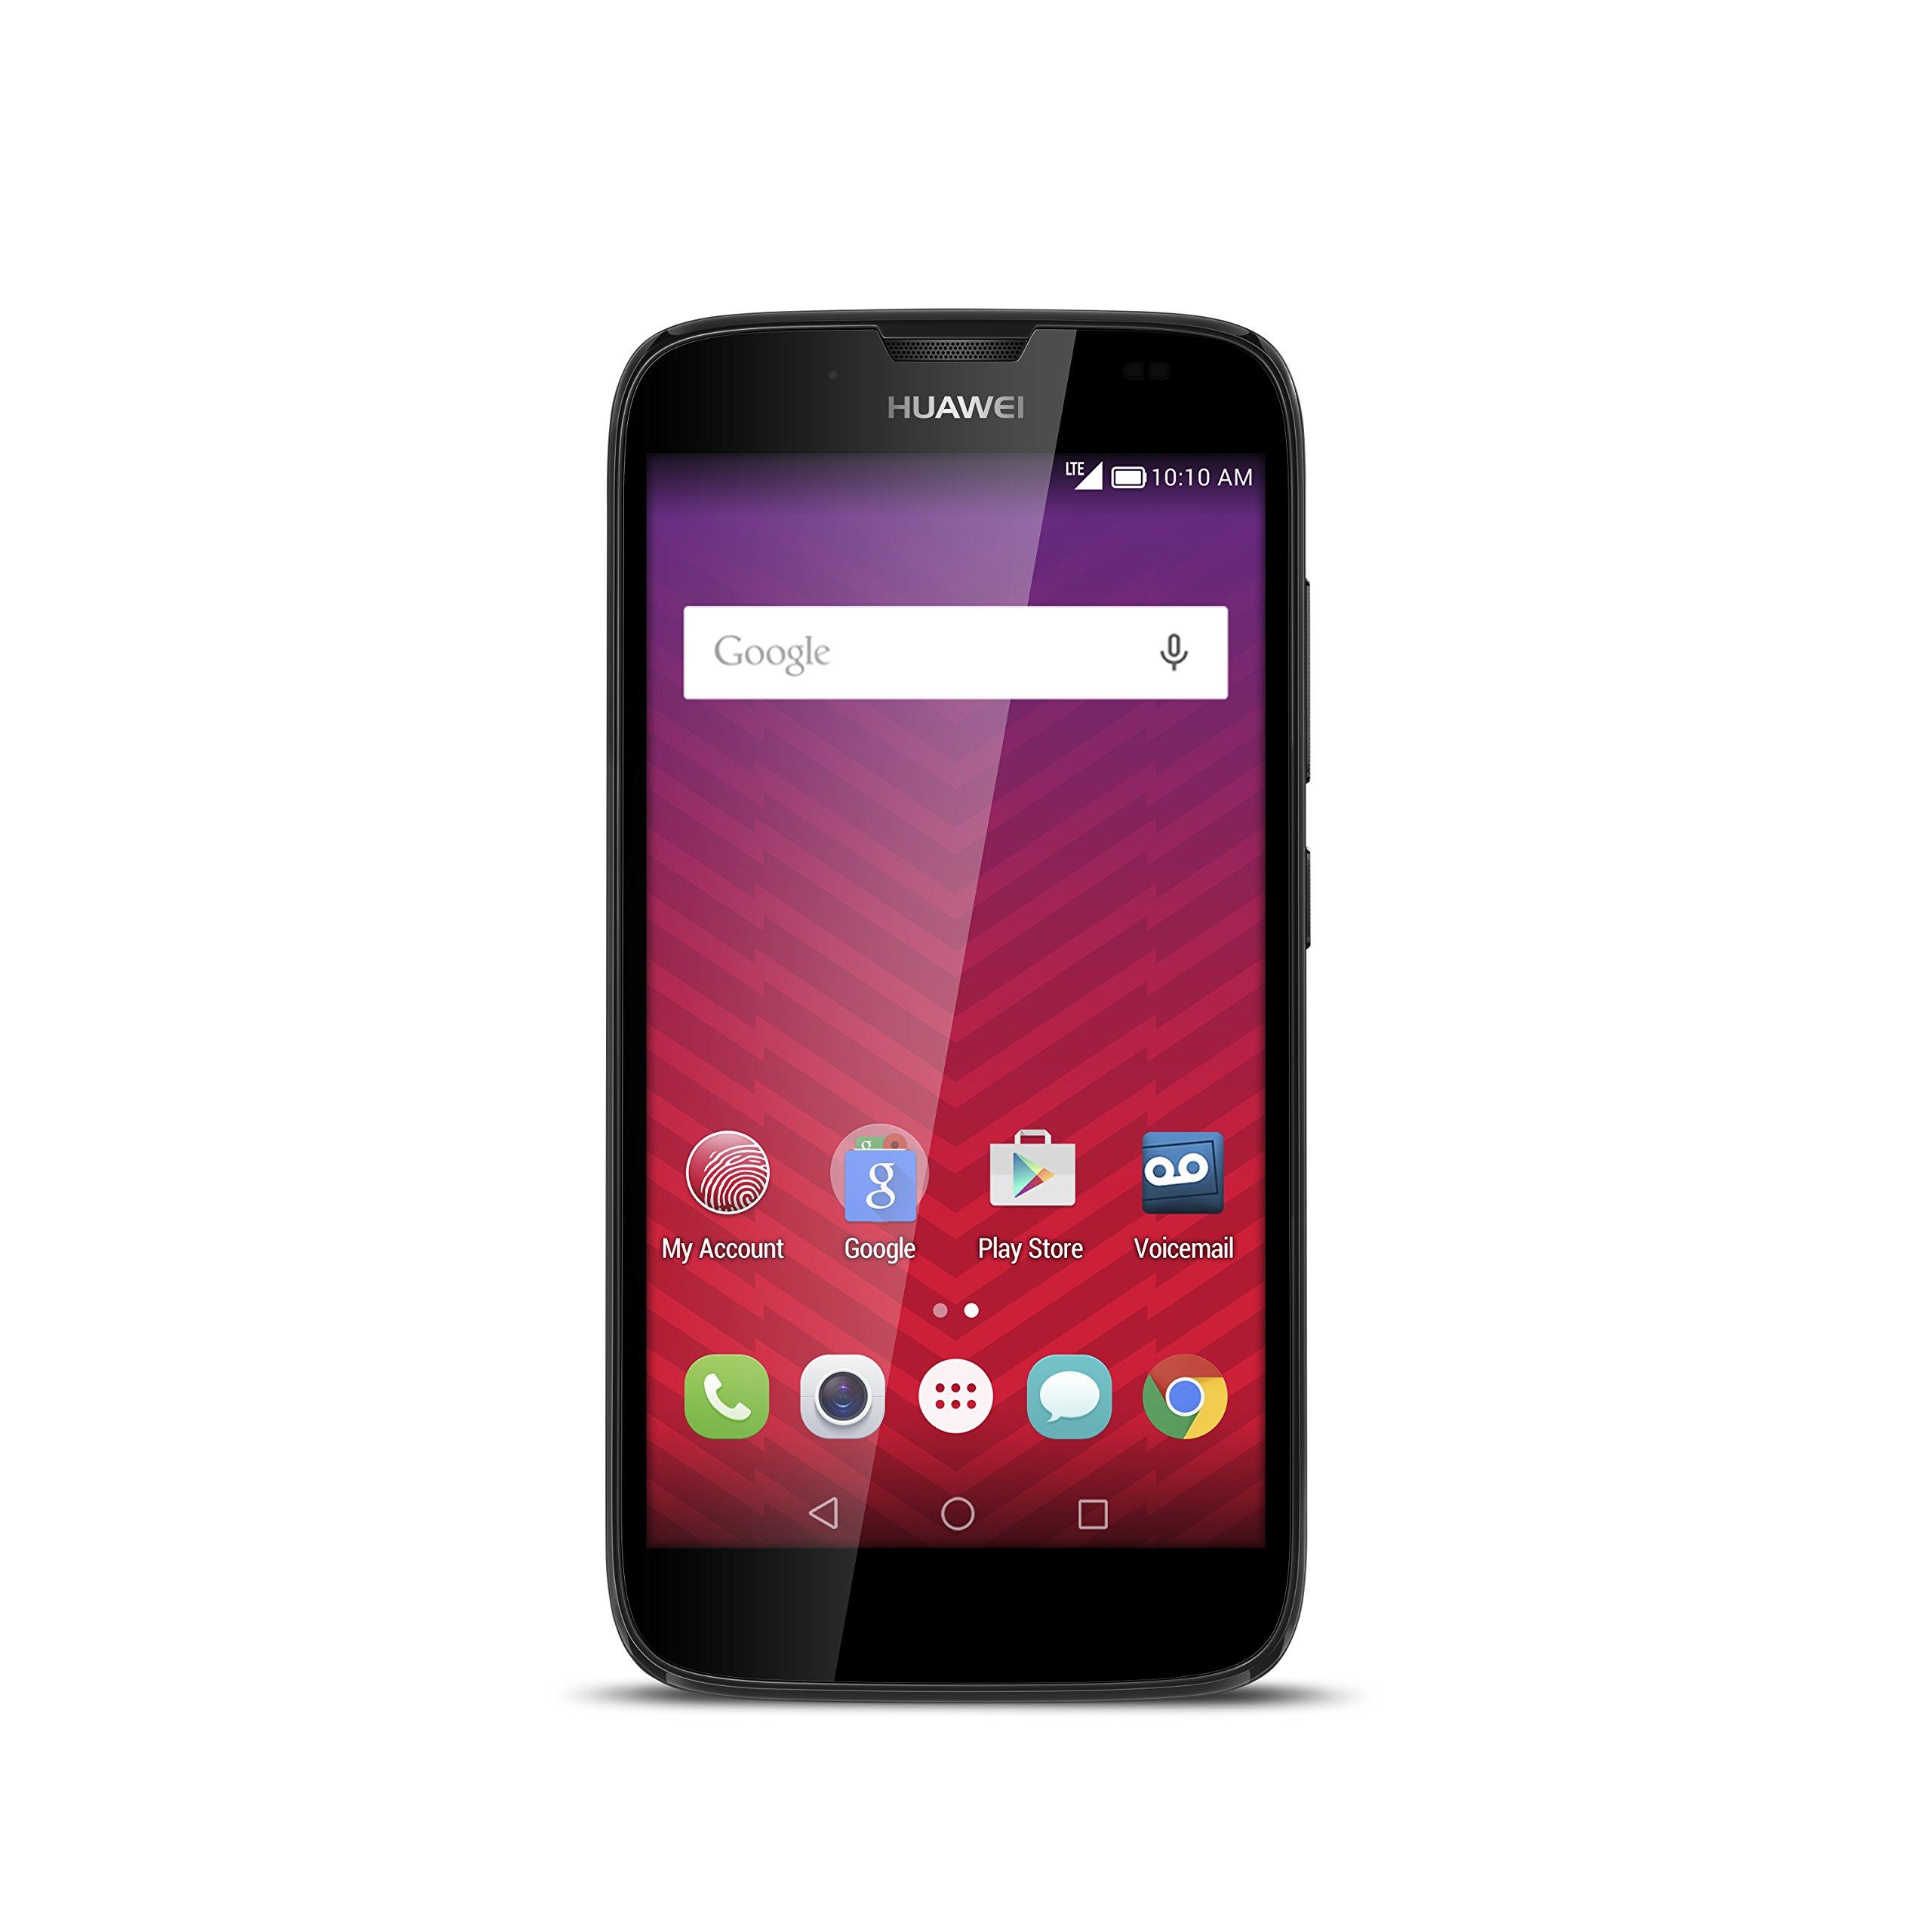 Huawei Union - No Contract Phone - Black - (Virgin Mobile)